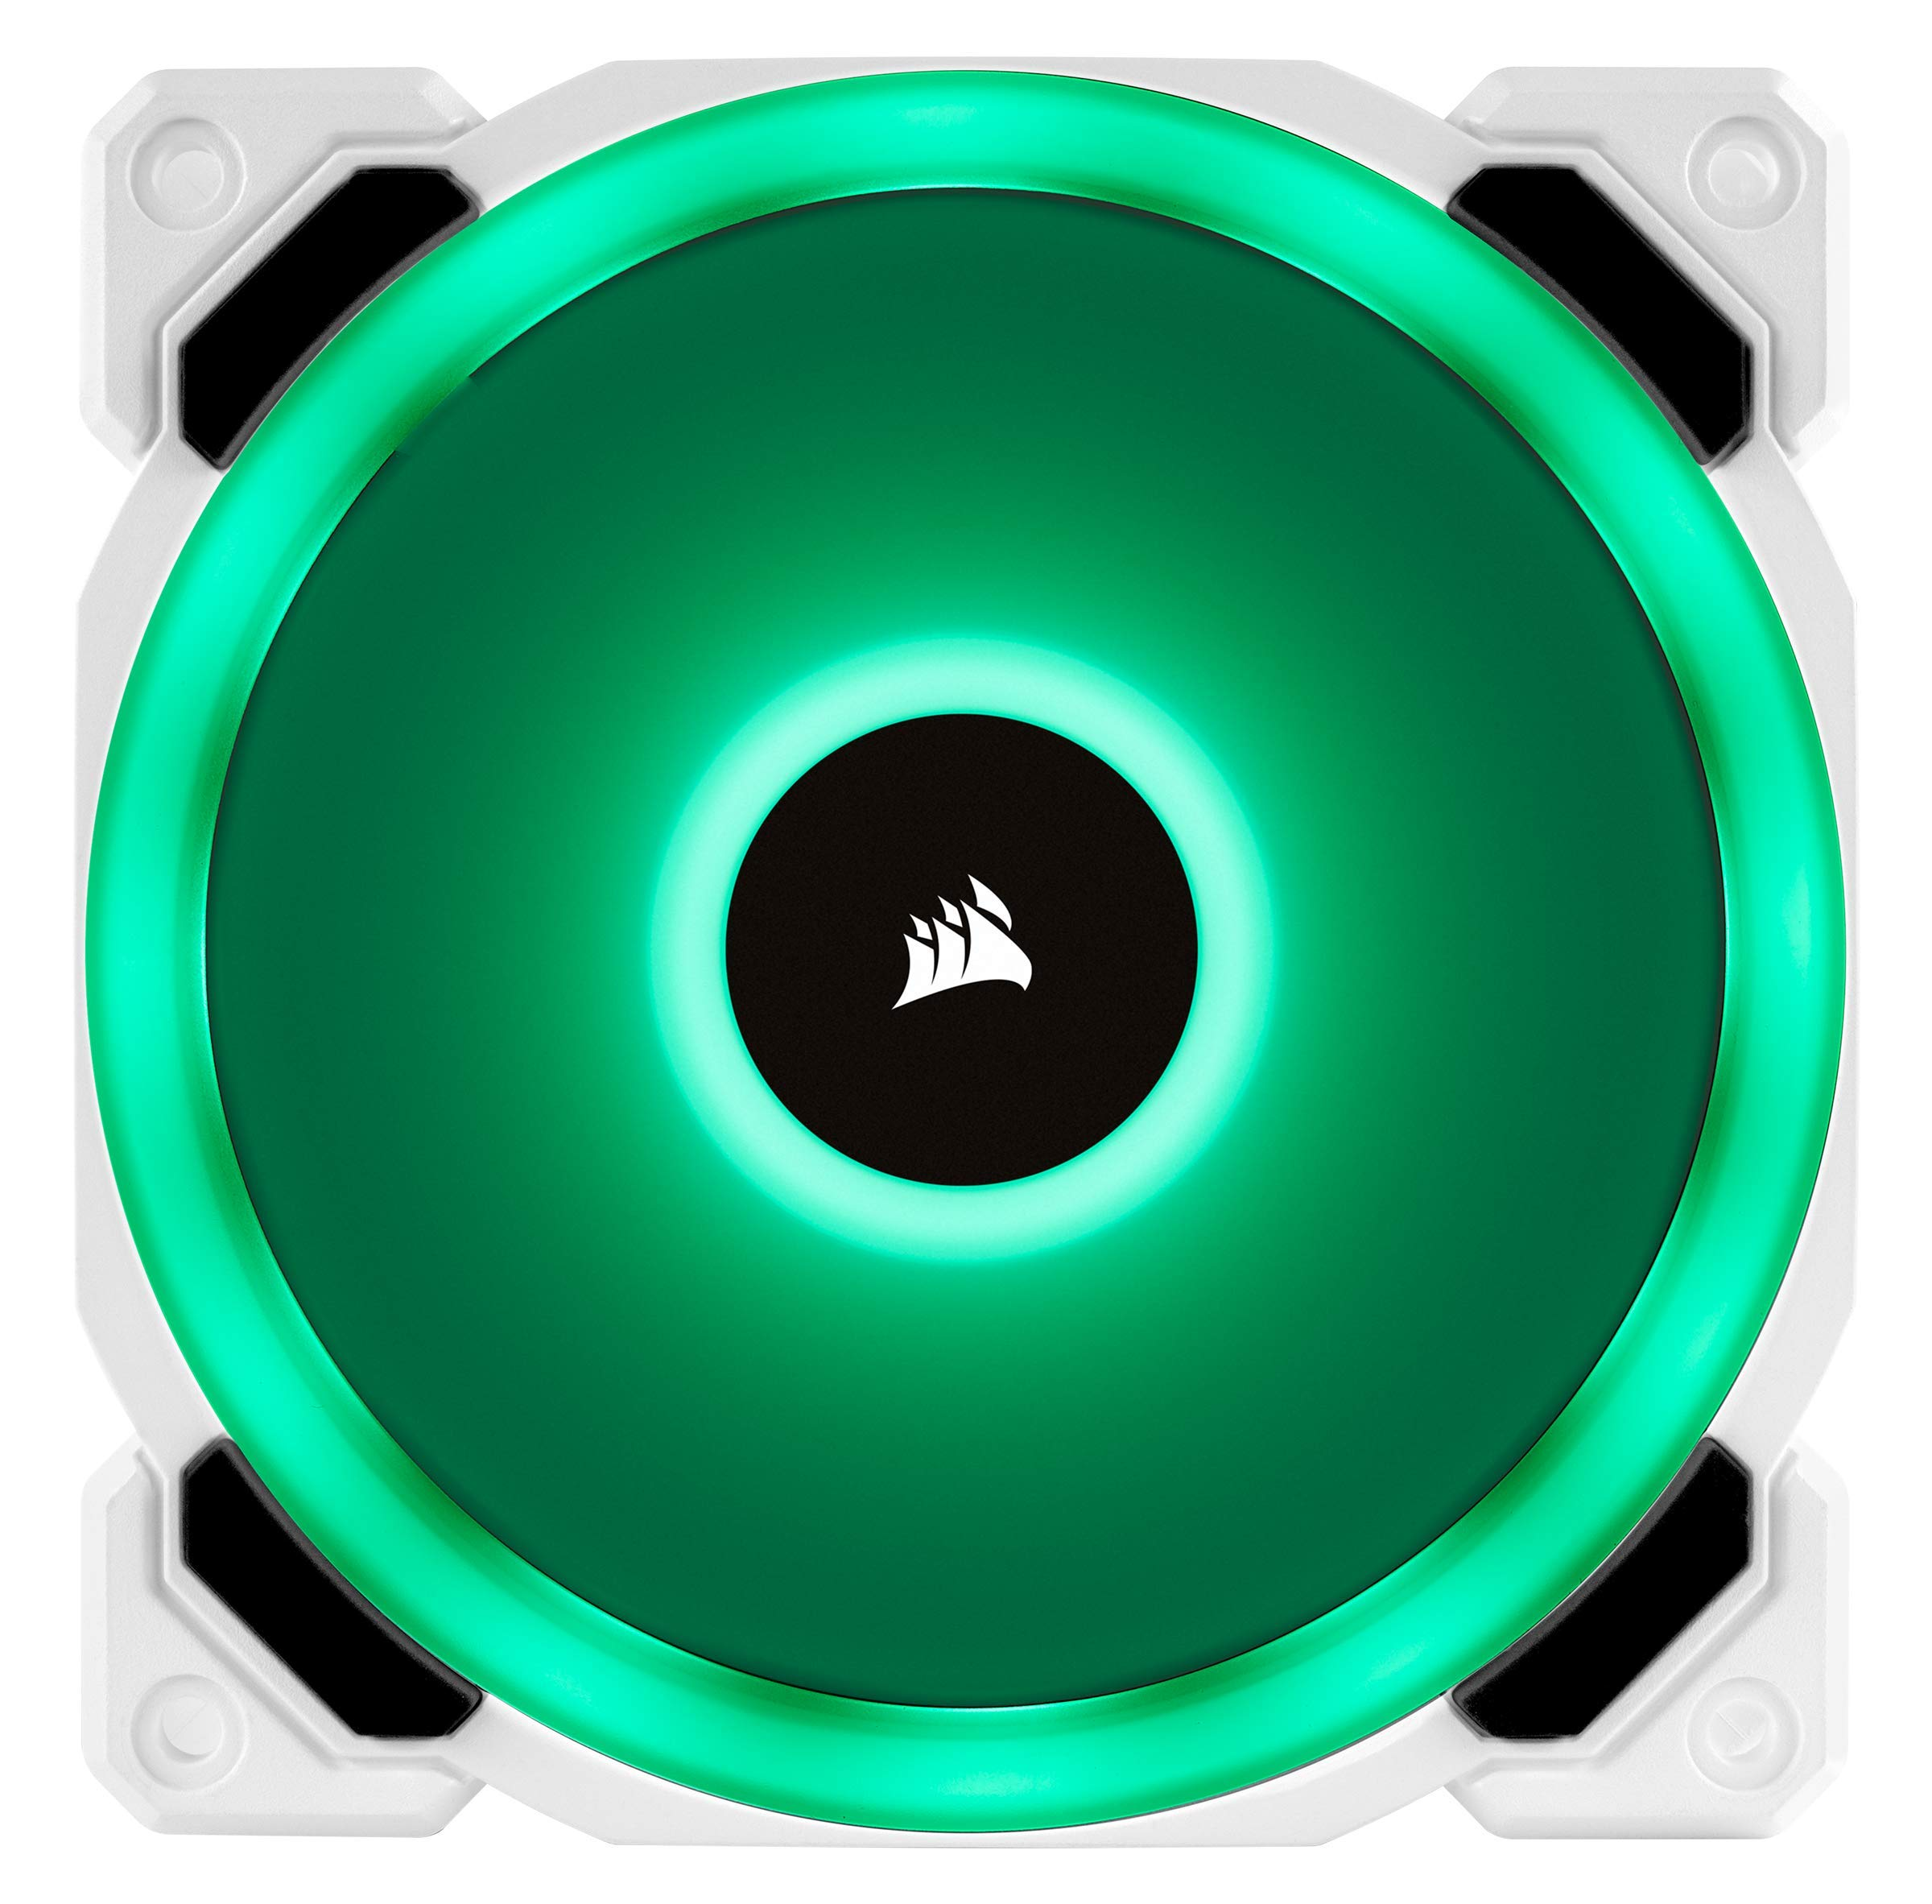 CORSAIR LL Series, LL120 RGB, 120mm RGB LED Fan, Triple Pack with Lighting Node PRO- White by Corsair (Image #9)